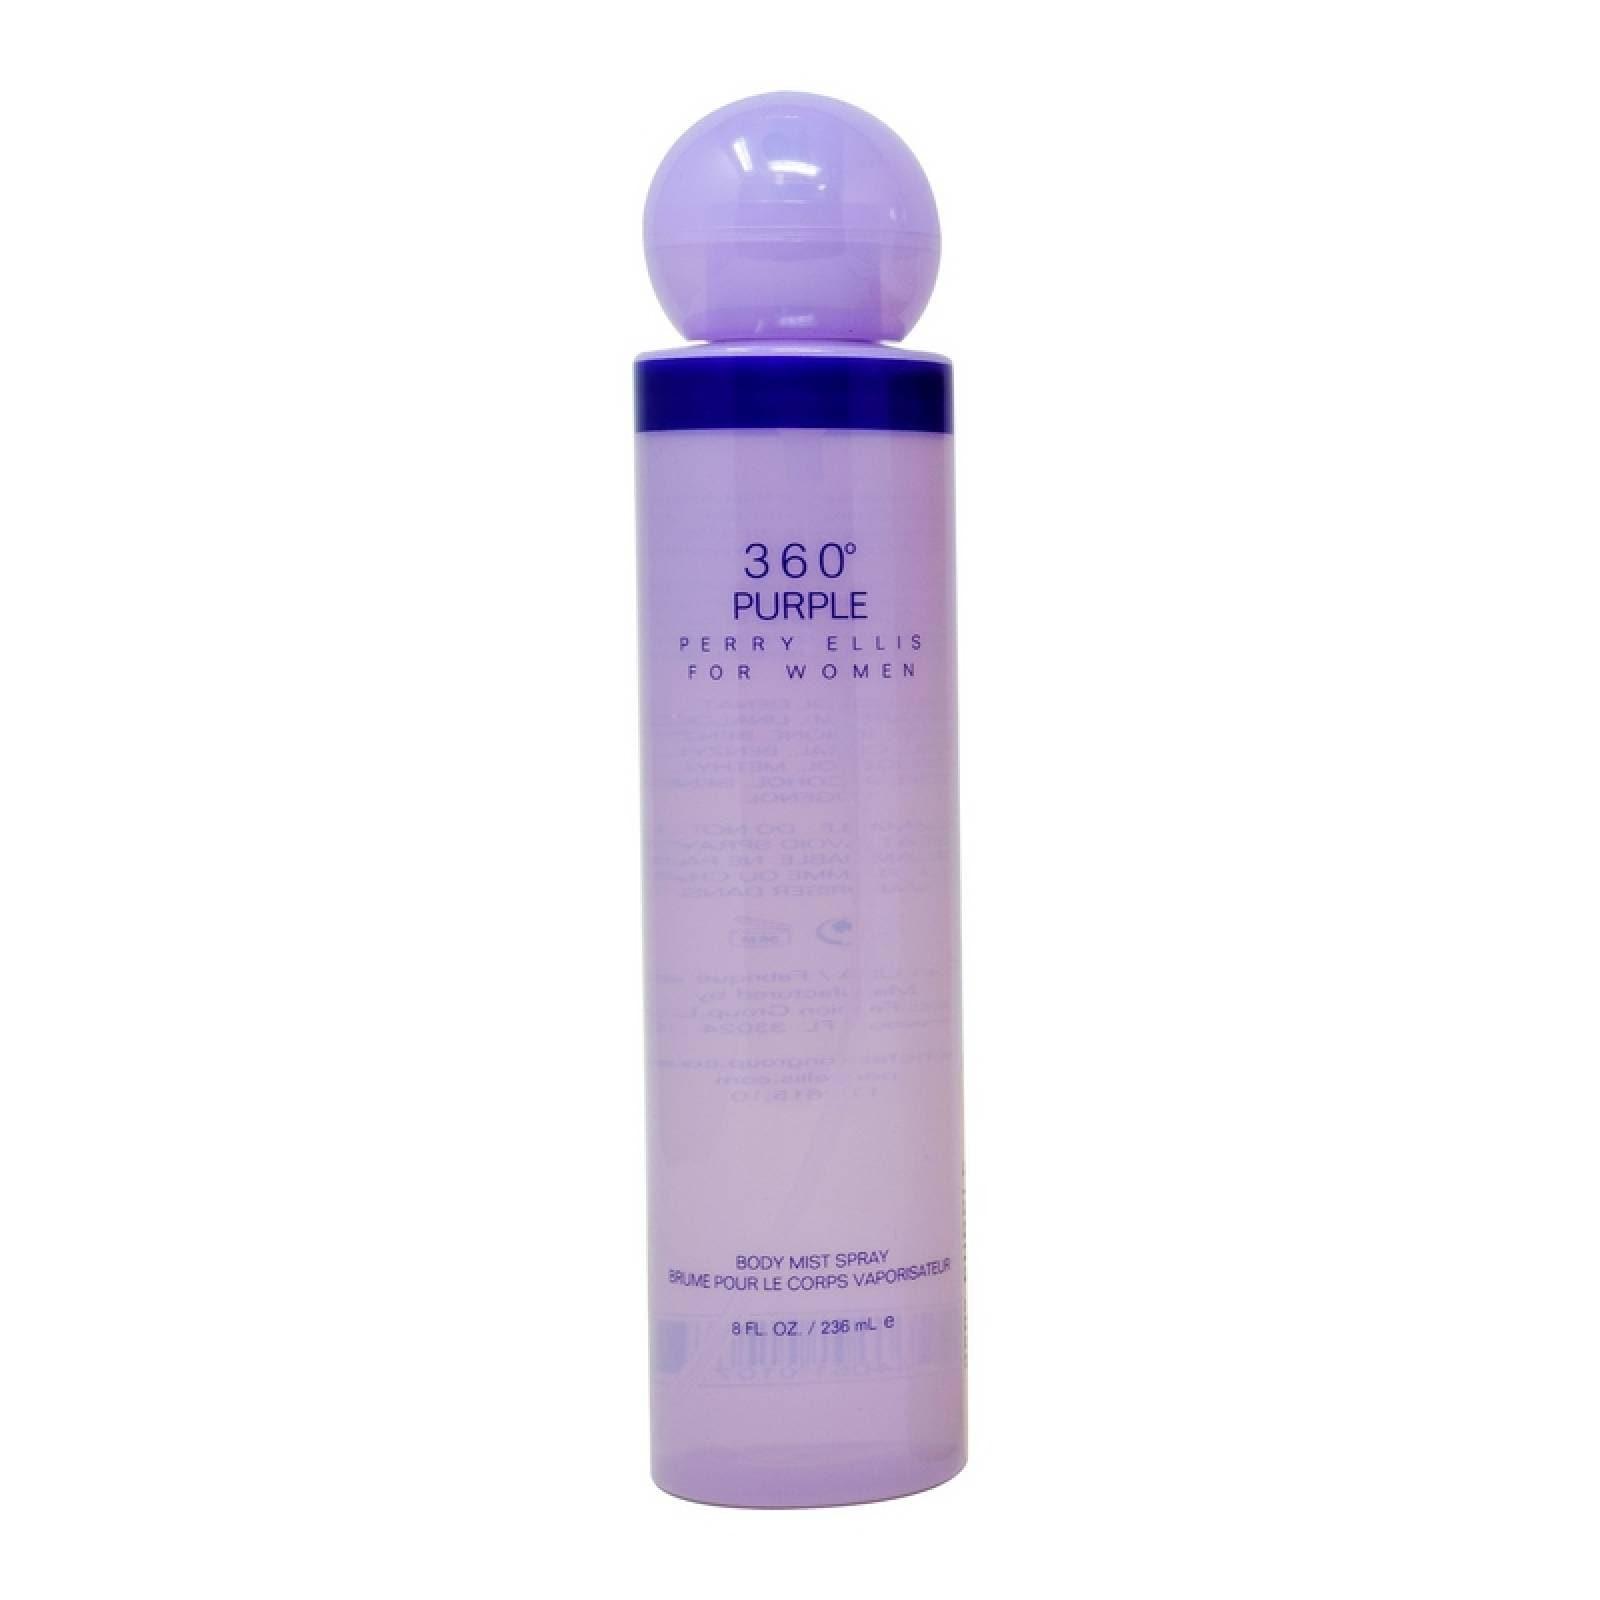 360° Purple 236 ml Body Mist Spray de Perry Ellis